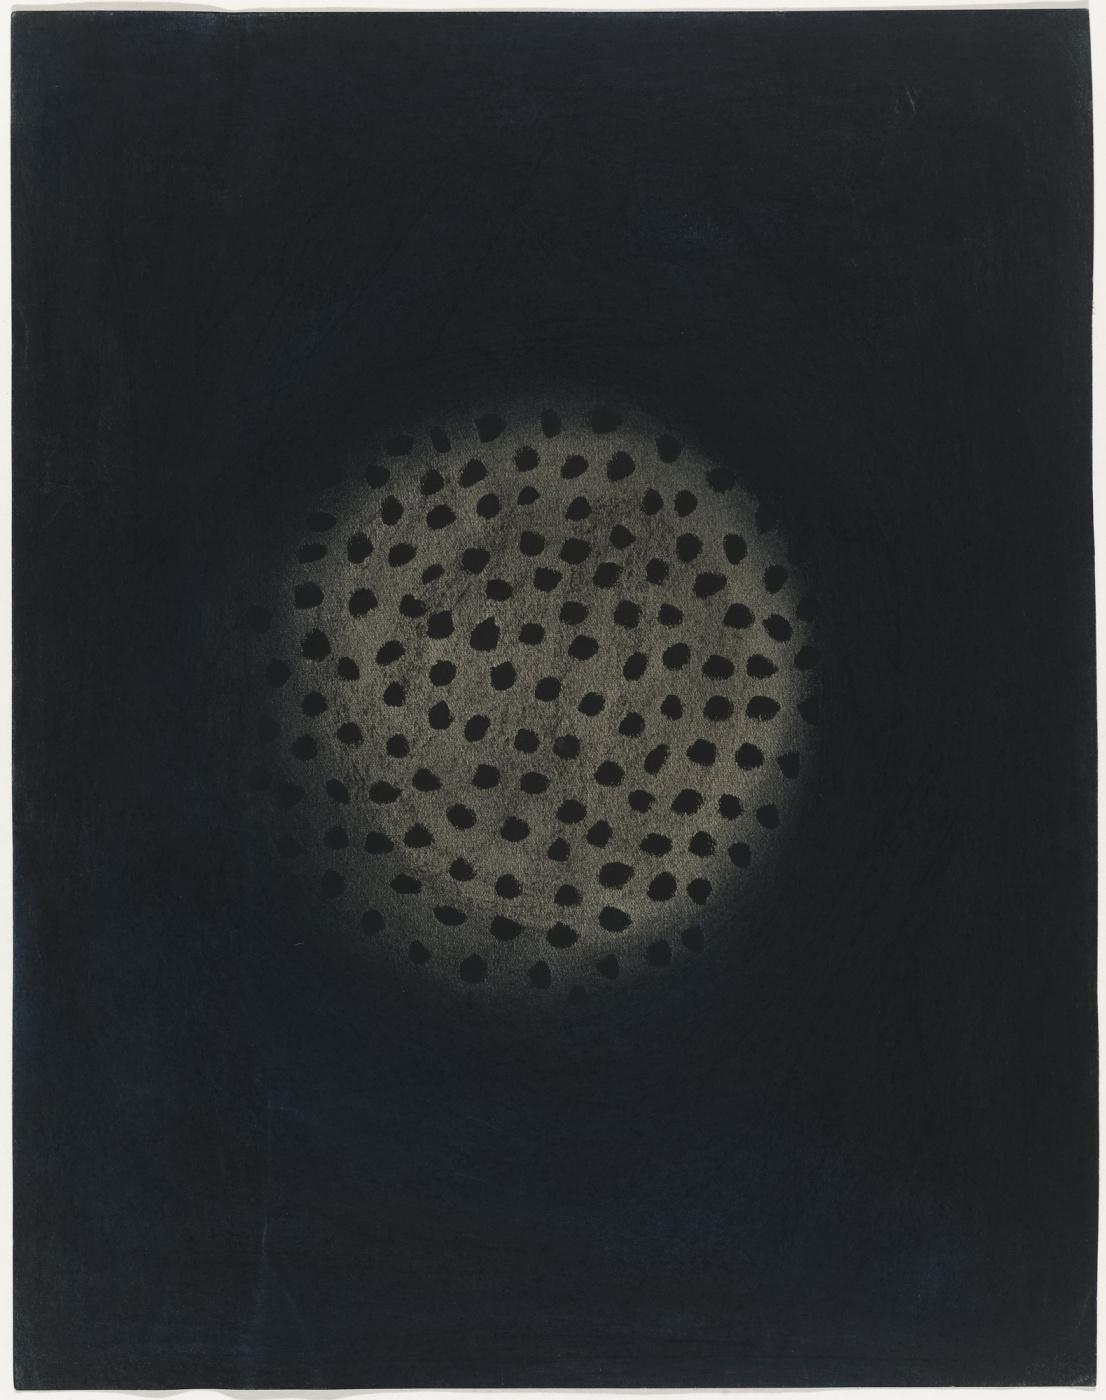 Yayoi Kusama. Untitled